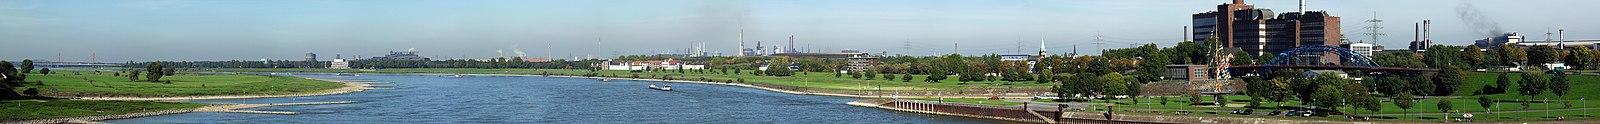 Duisburg-Panorama ThyssenKrupp.jpg